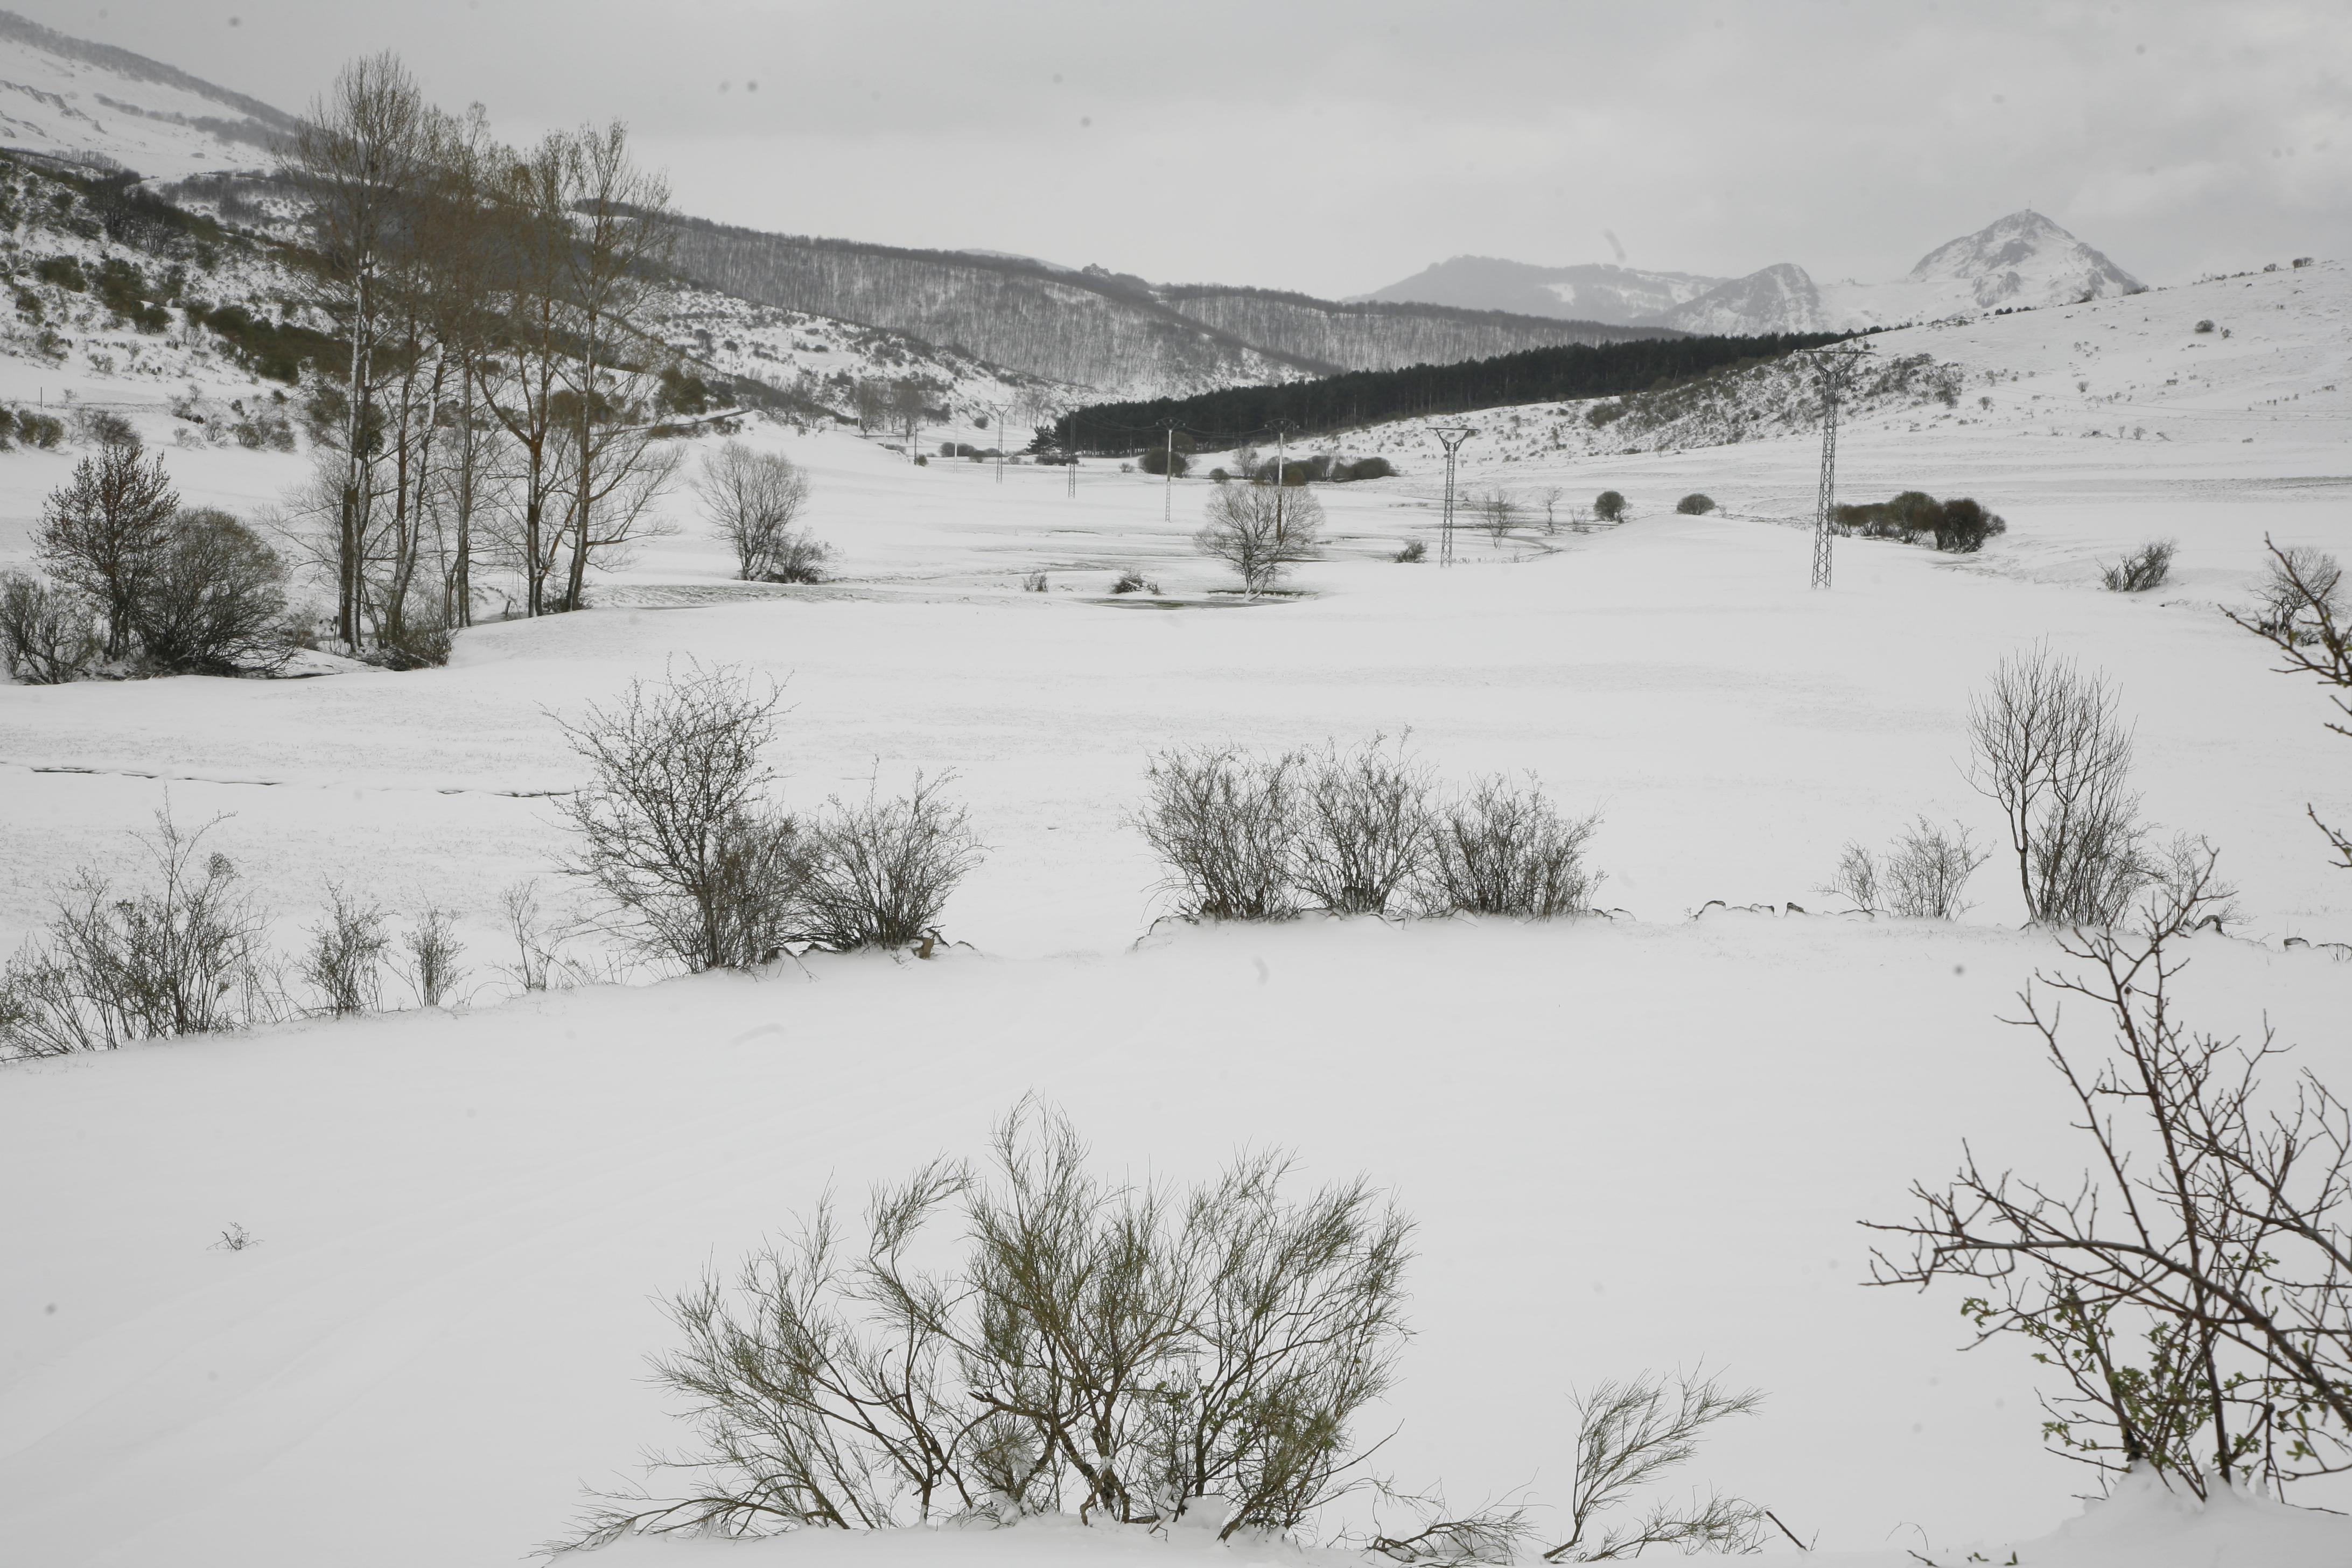 Camasobres-paisaje 007